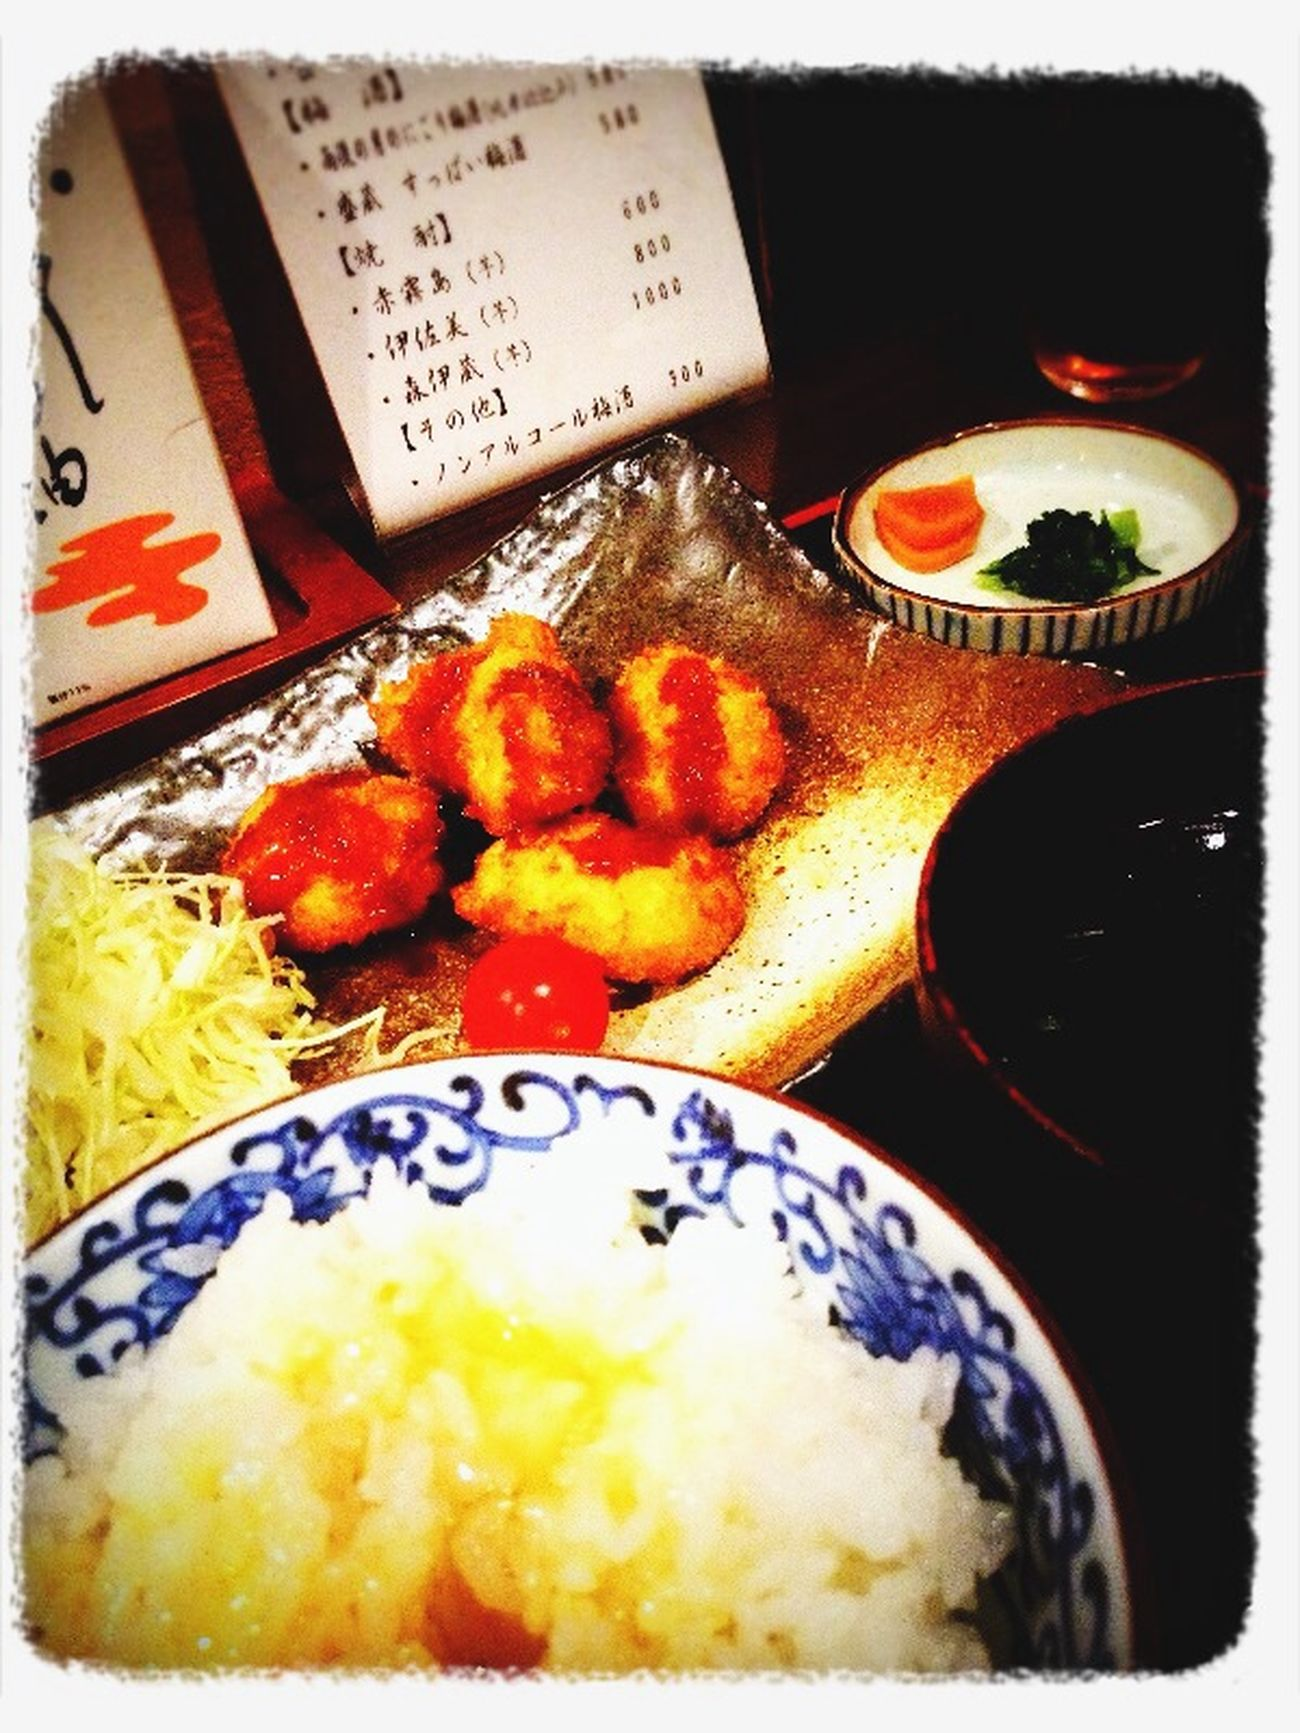 Lunch Lunch Time! Japanese Food Japan 鶏カツ定食300円(ʘʖ̮ʘ)